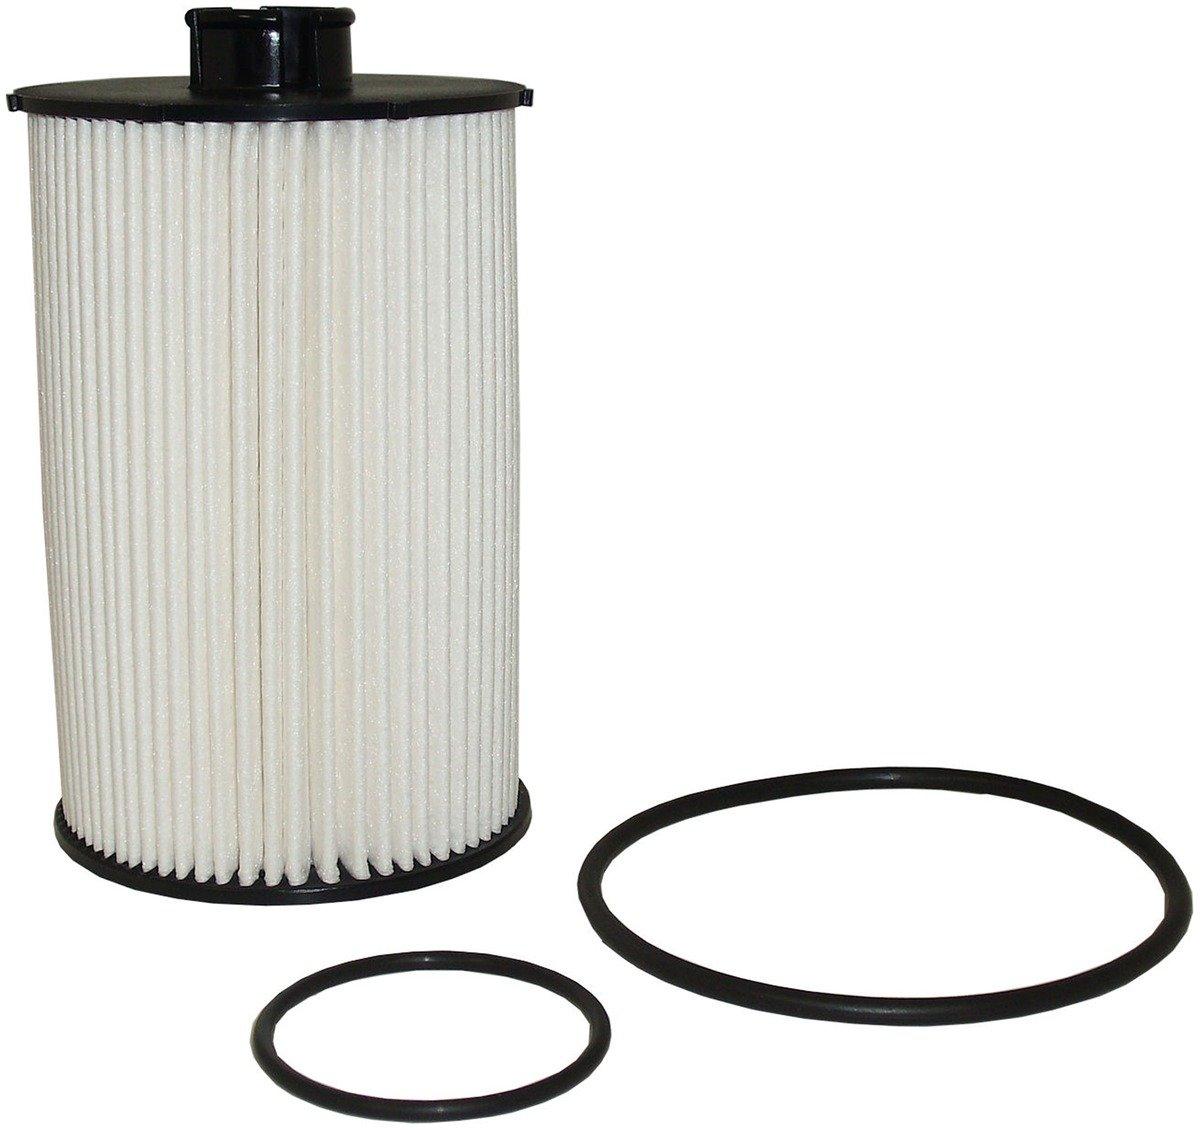 Luber-finer L5086F Heavy Duty Fuel Filter